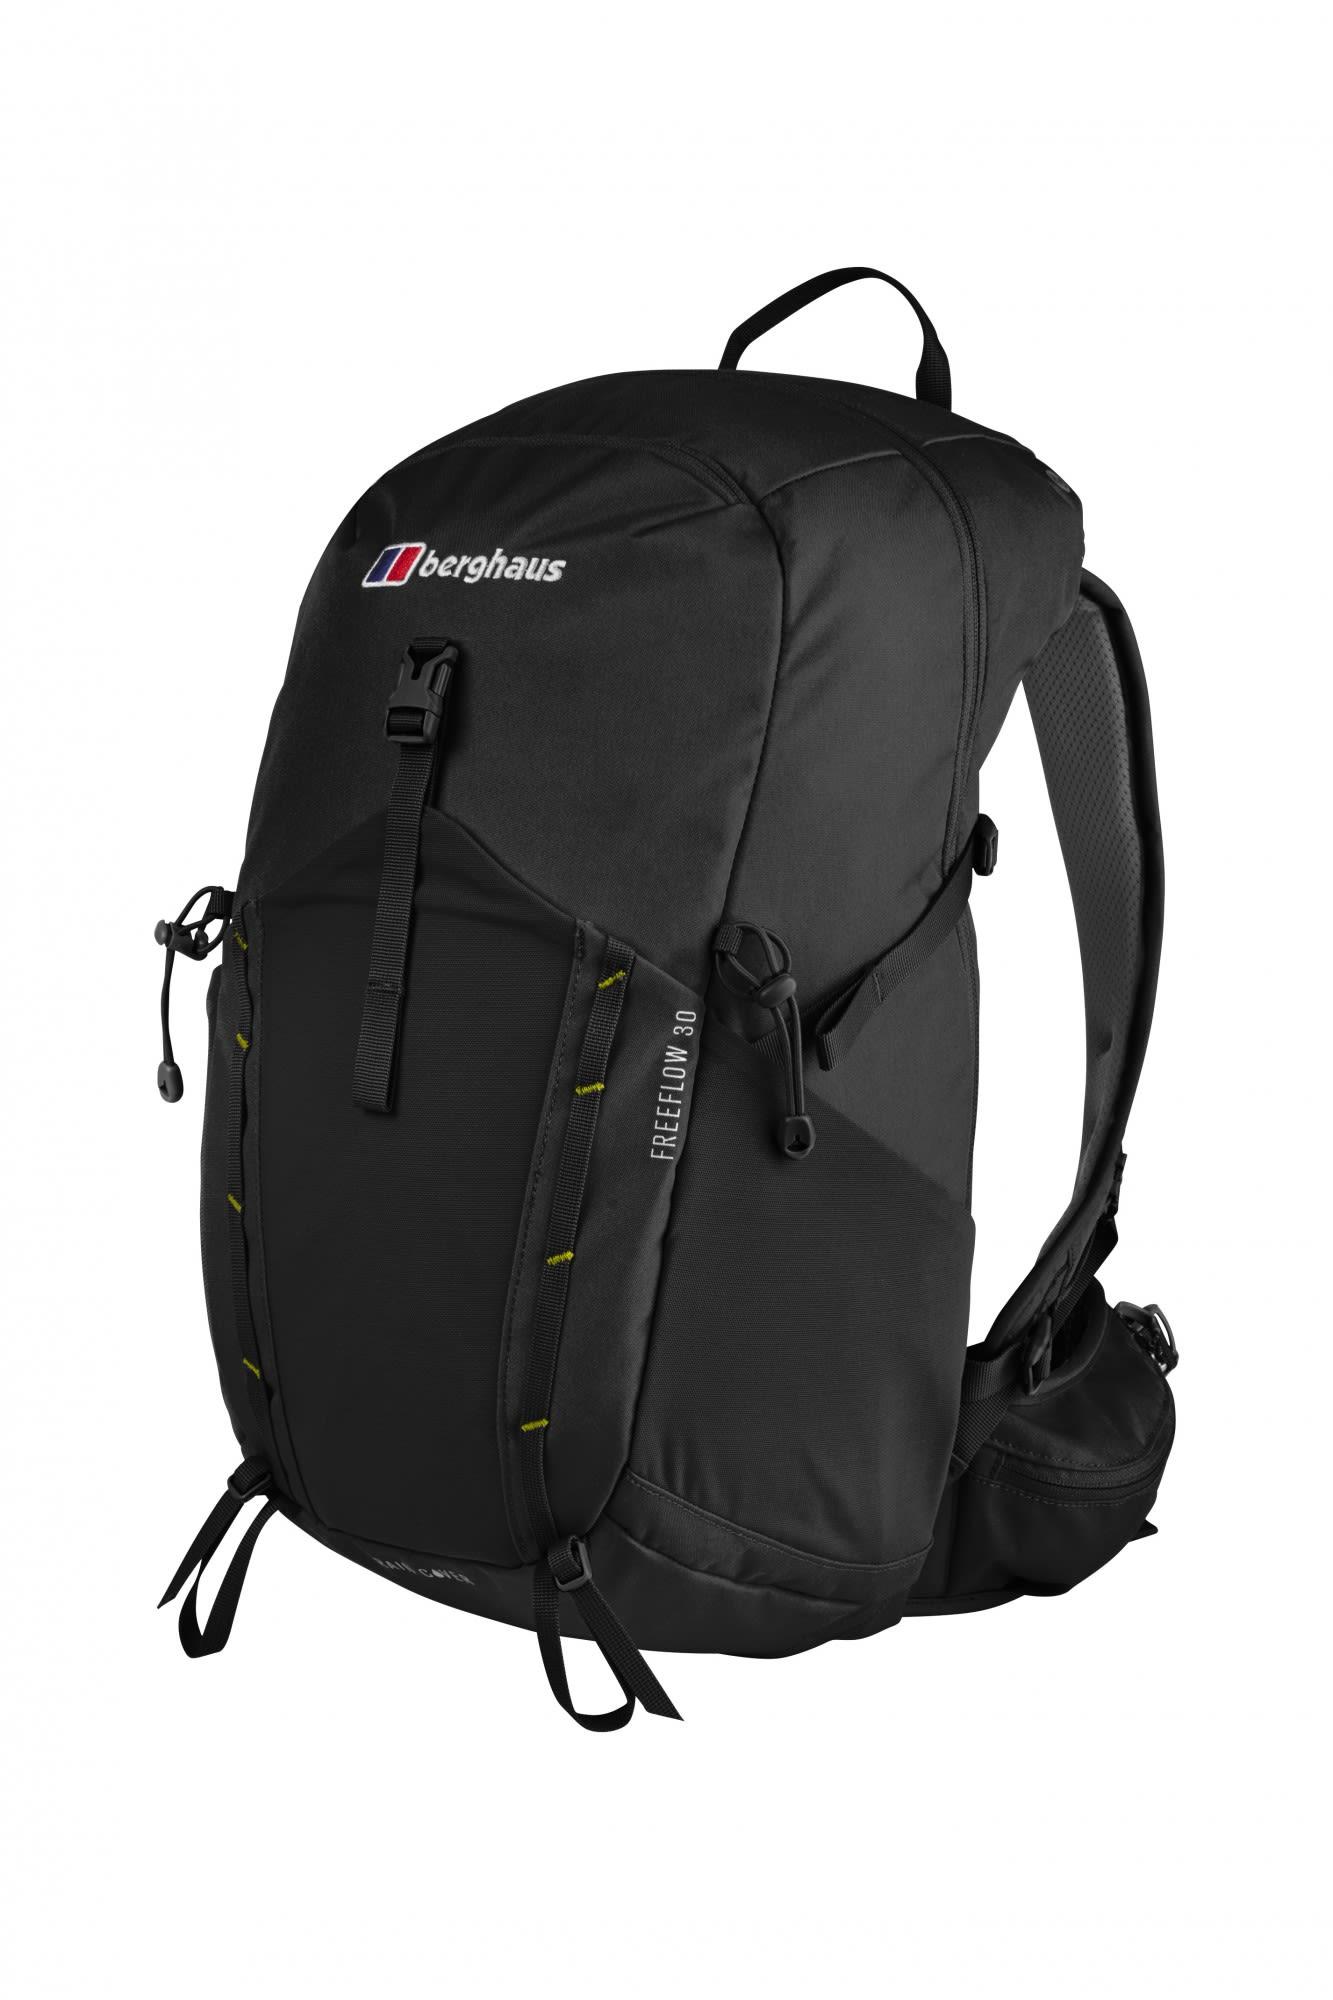 Berghaus Freeflow 30 Backpack | Größe 30l |  Alpin- & Trekkingrucksack